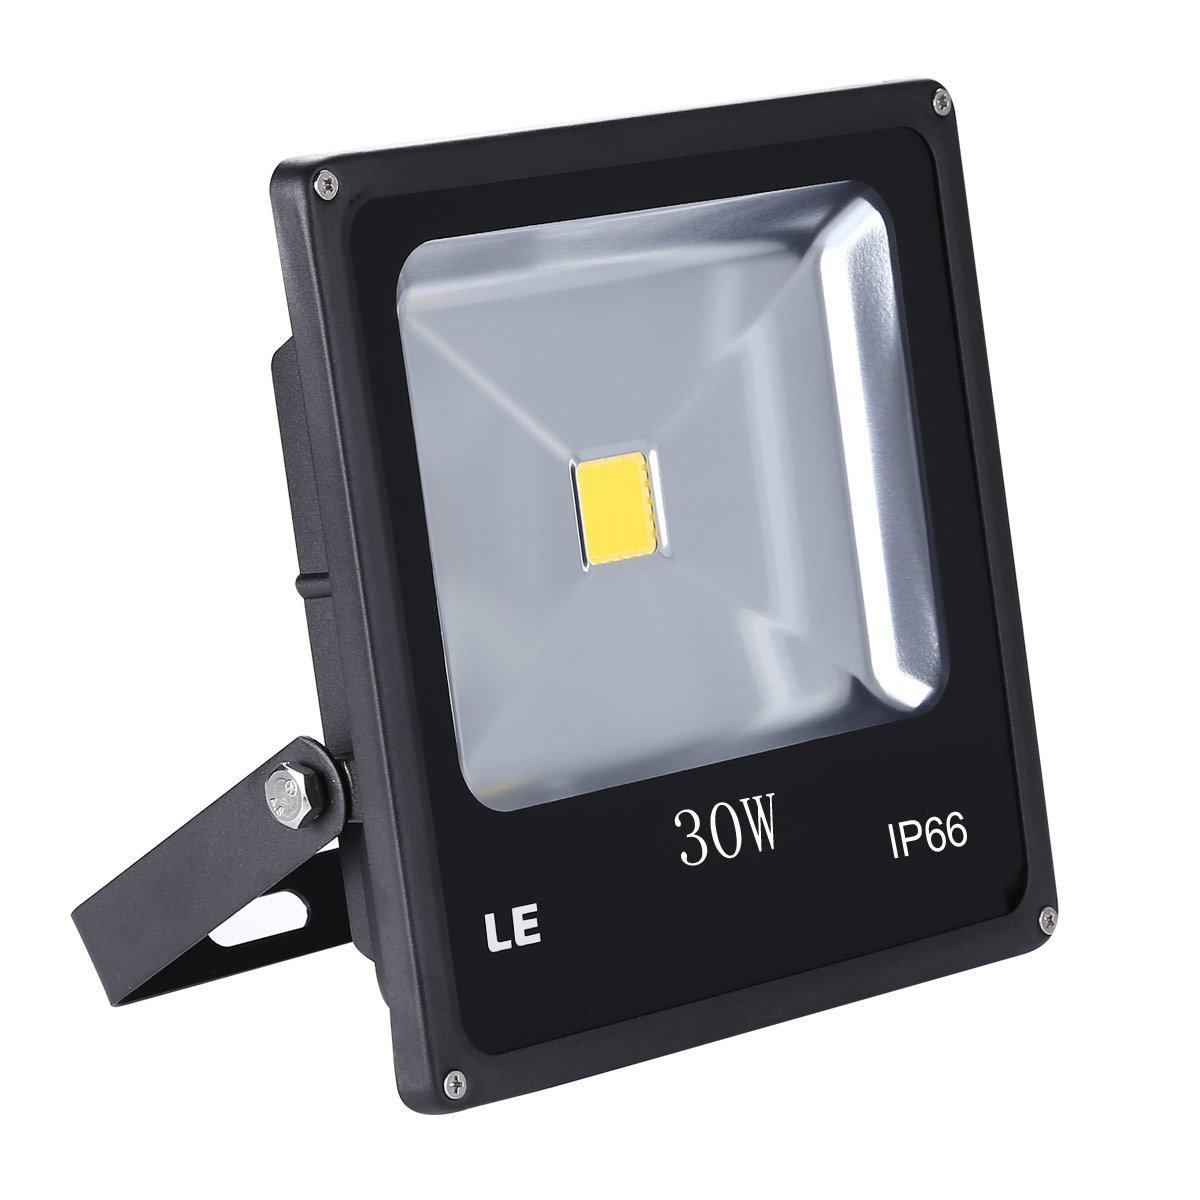 LE 30W Super Bright Outdoor LED Flood Lights 75W HPS Bulb Equivalent Daylight White  sc 1 st  Amazon.ca & Lighting EVER 50W Super Bright Outdoor LED Flood Lights 150W HPS ...